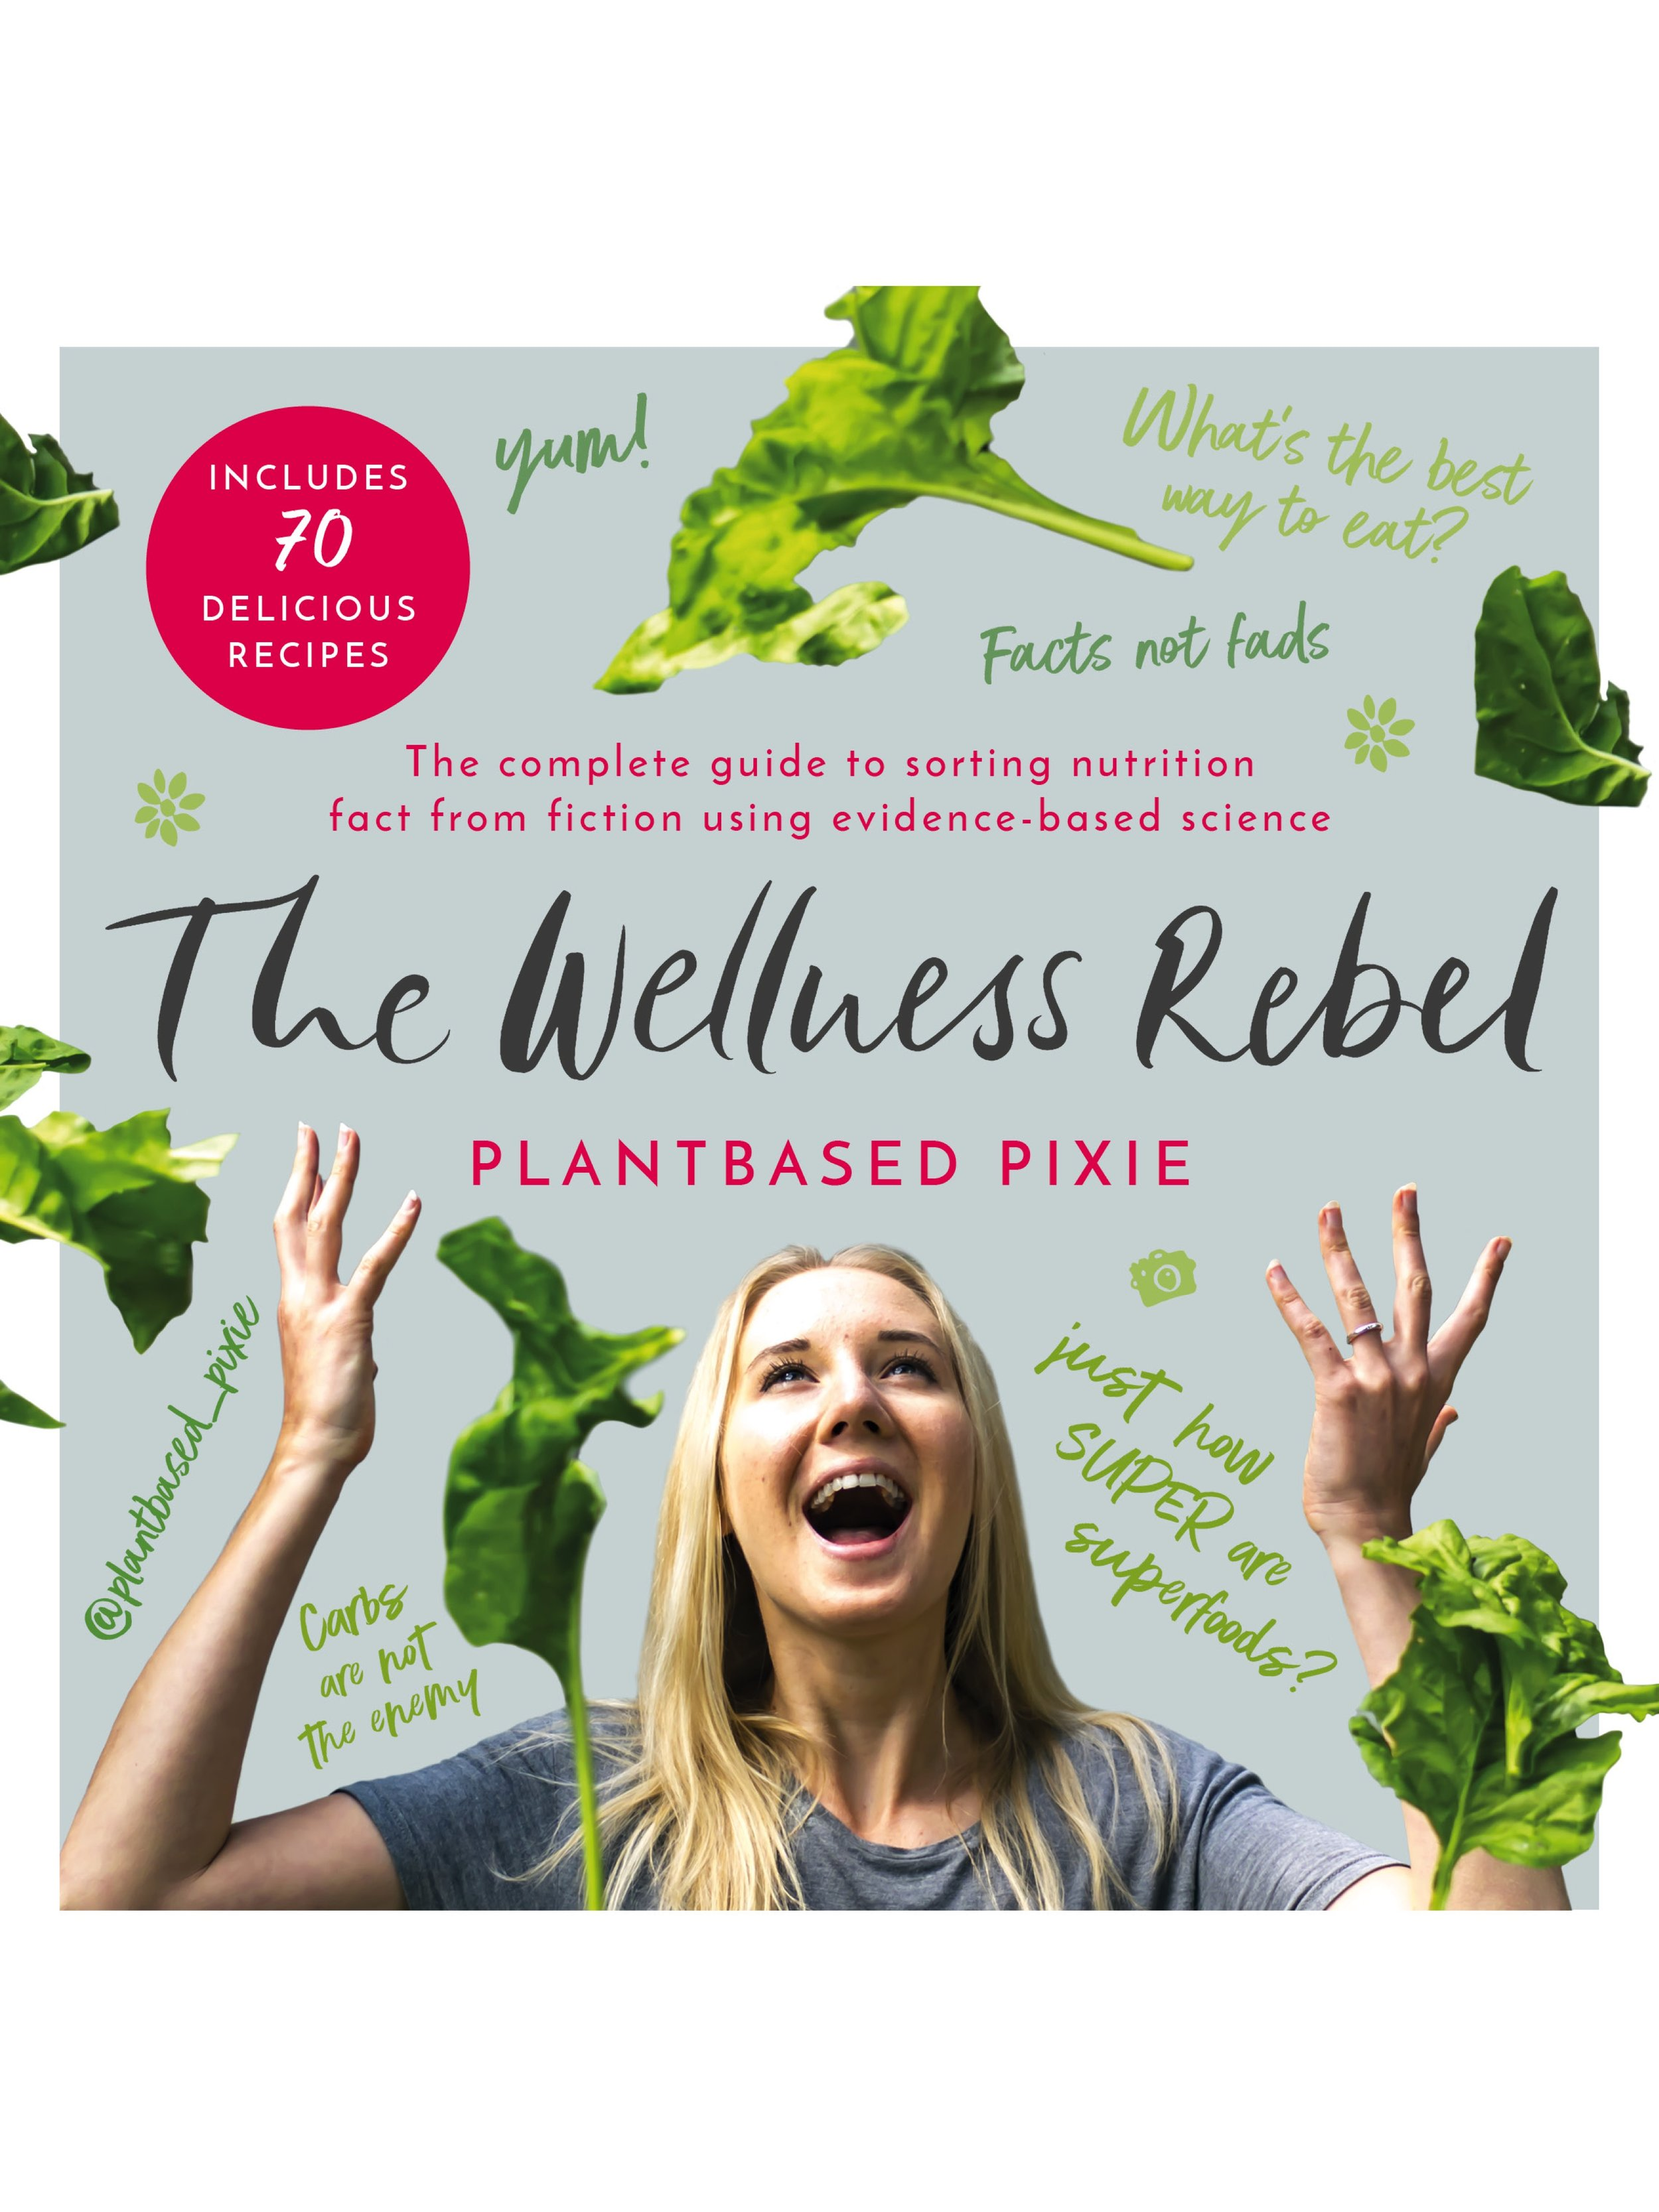 THE WELLNESS REBEL by Pixie Turner